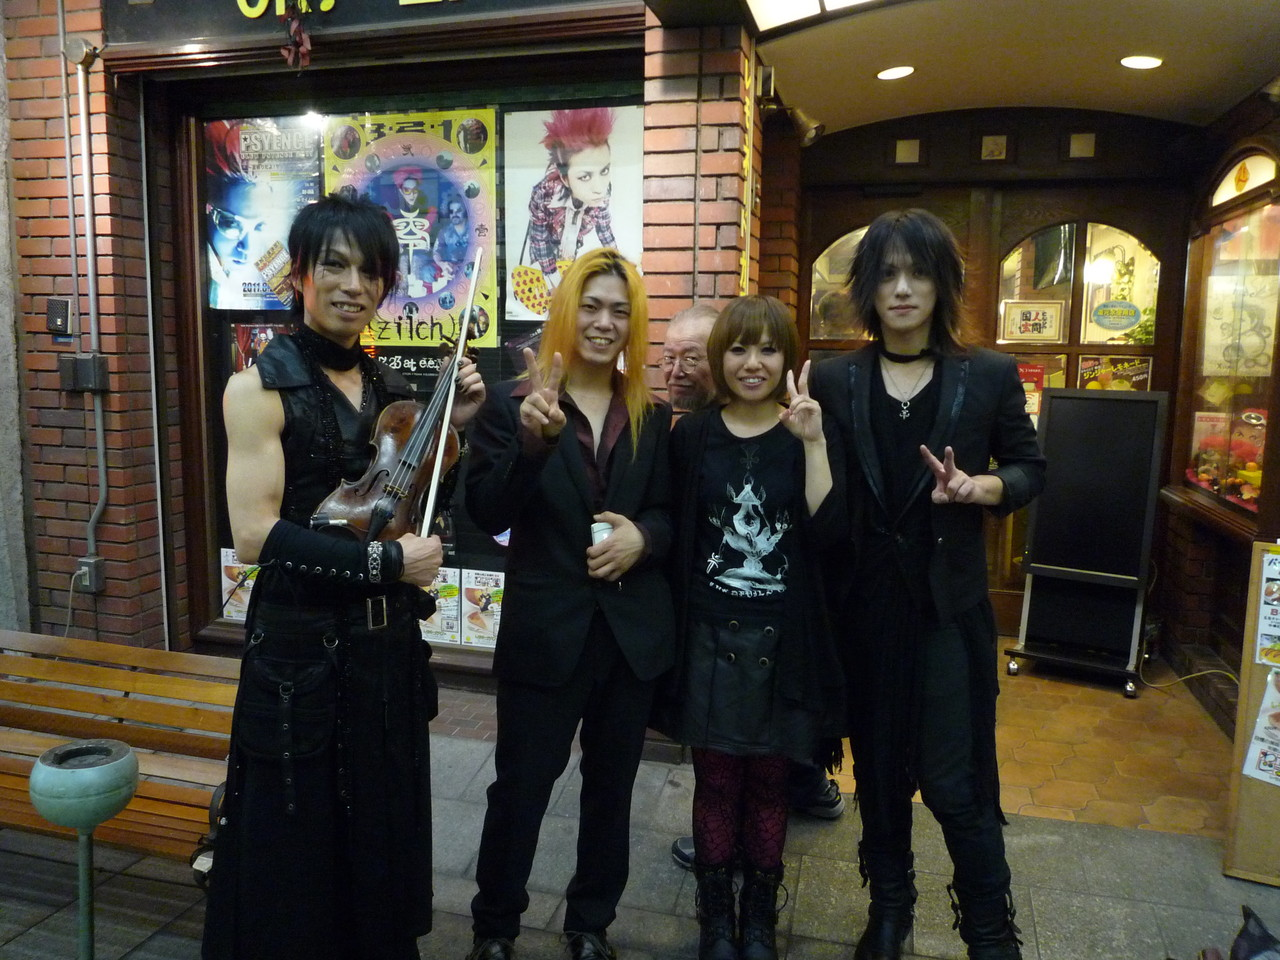 Take&YUSHI&MisukE&SHAVAZOで記念写真☆ マスターがどこかに隠れてますので探してみてください(^-^)